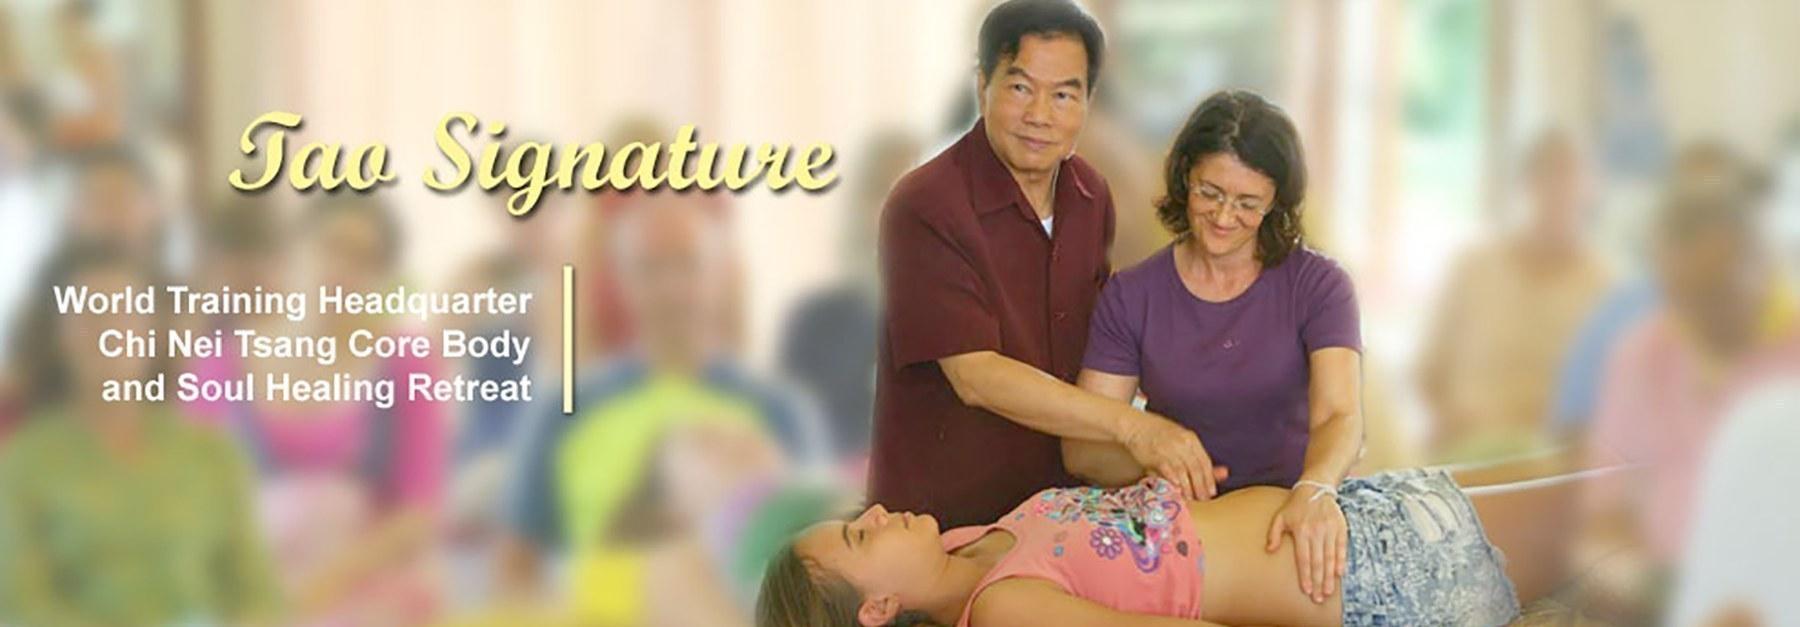 Tao Signature – World Training Headquarter Chi Nei Tsang Core Body and Soul Healing Retreat